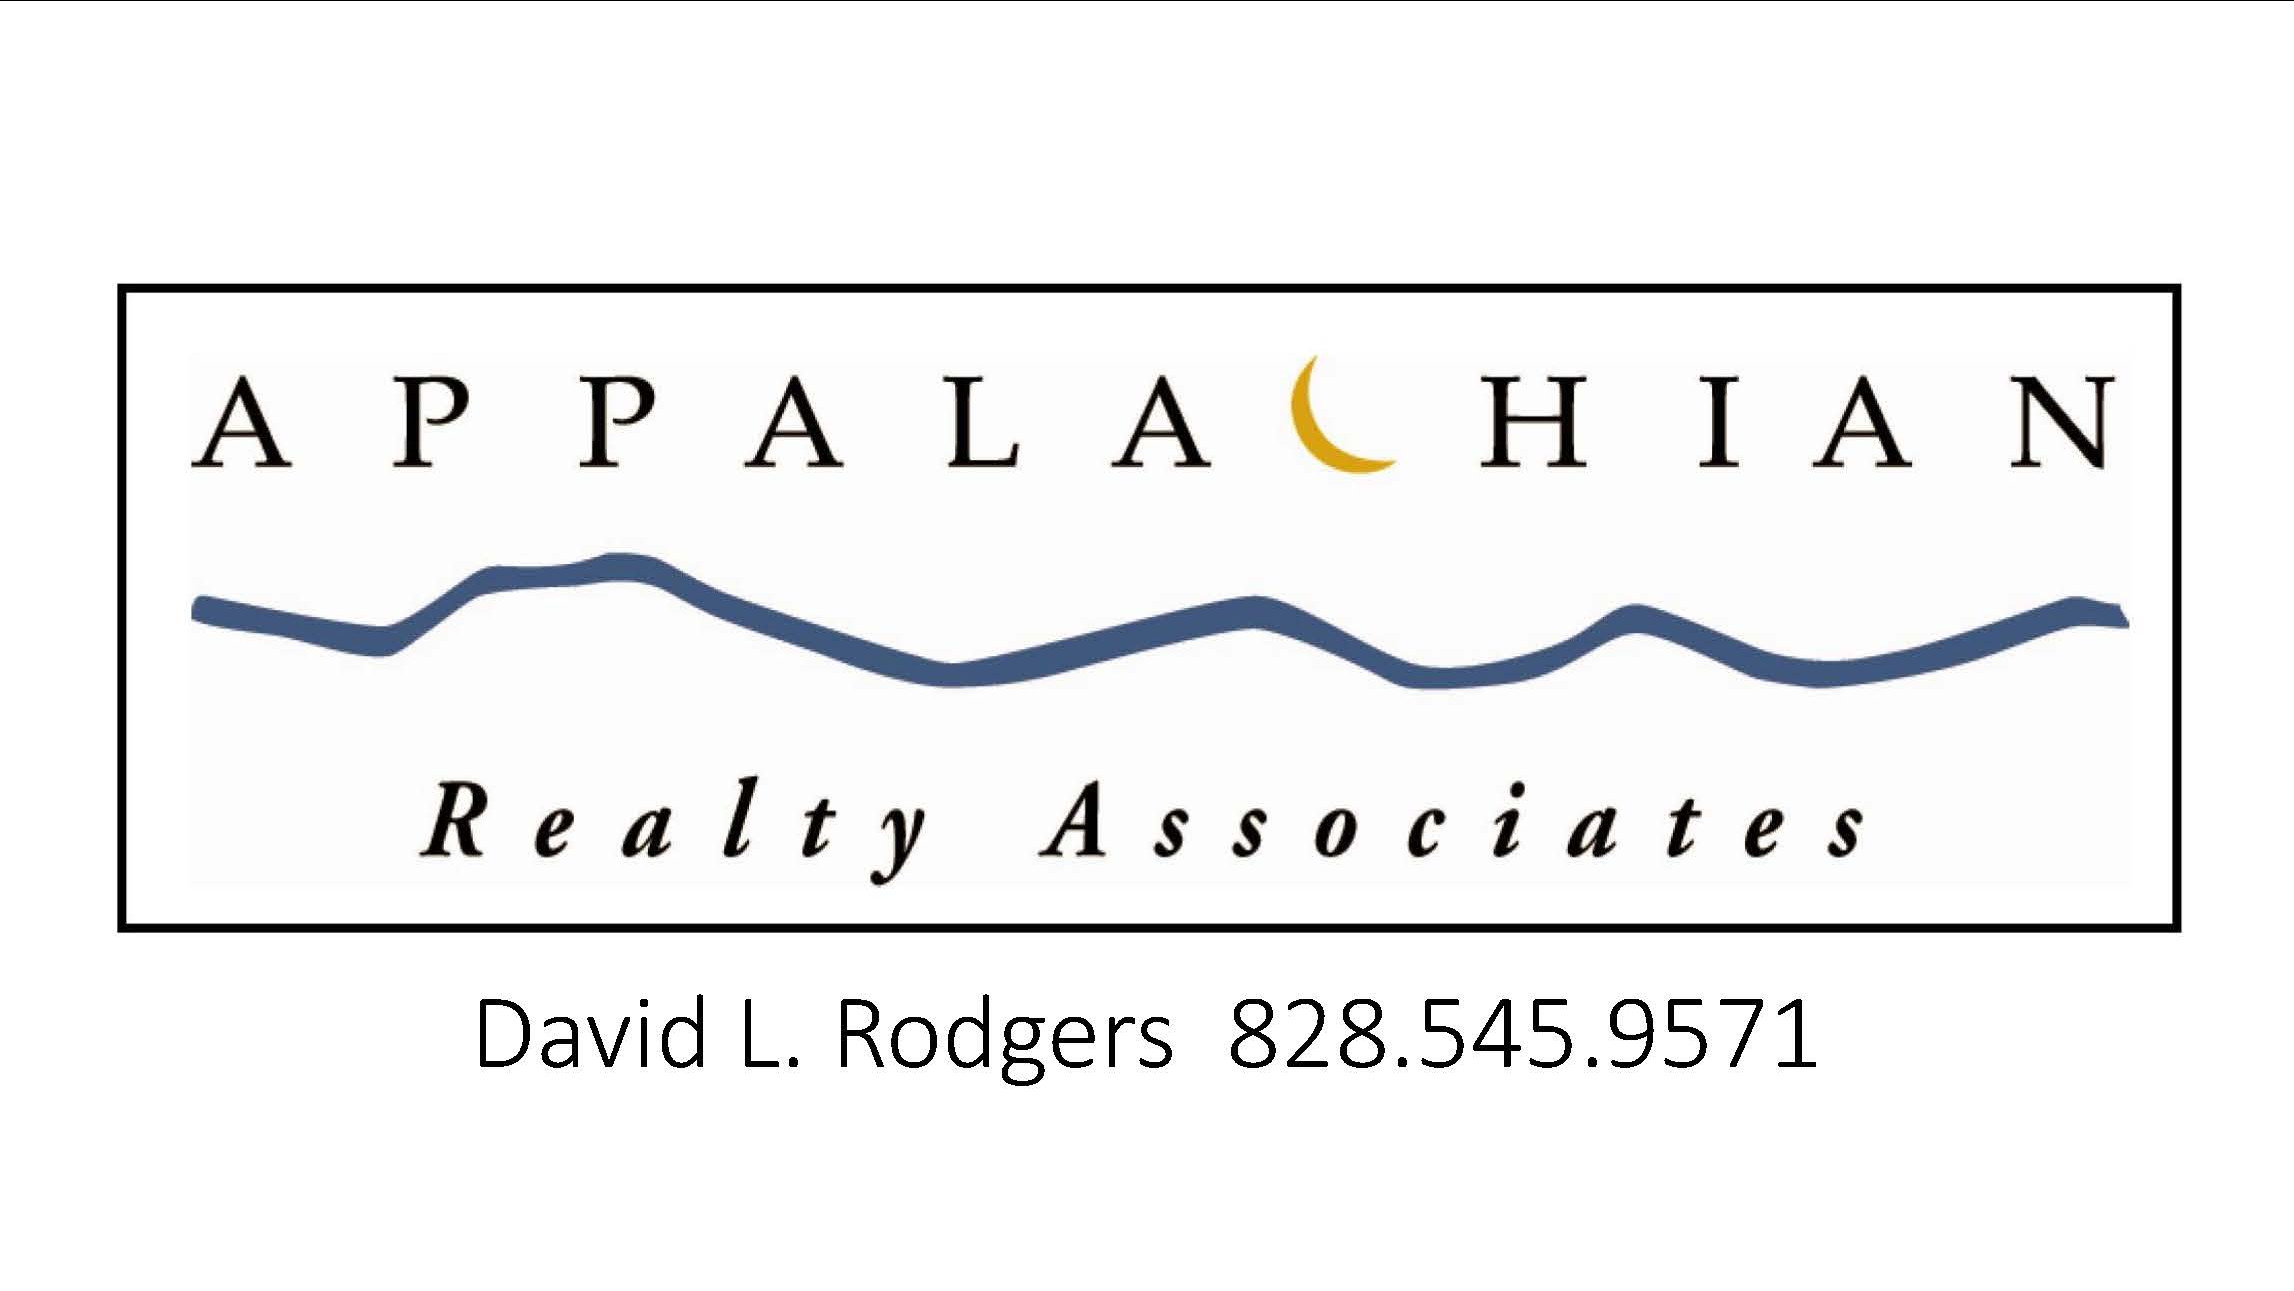 Appalachian Realty Associates